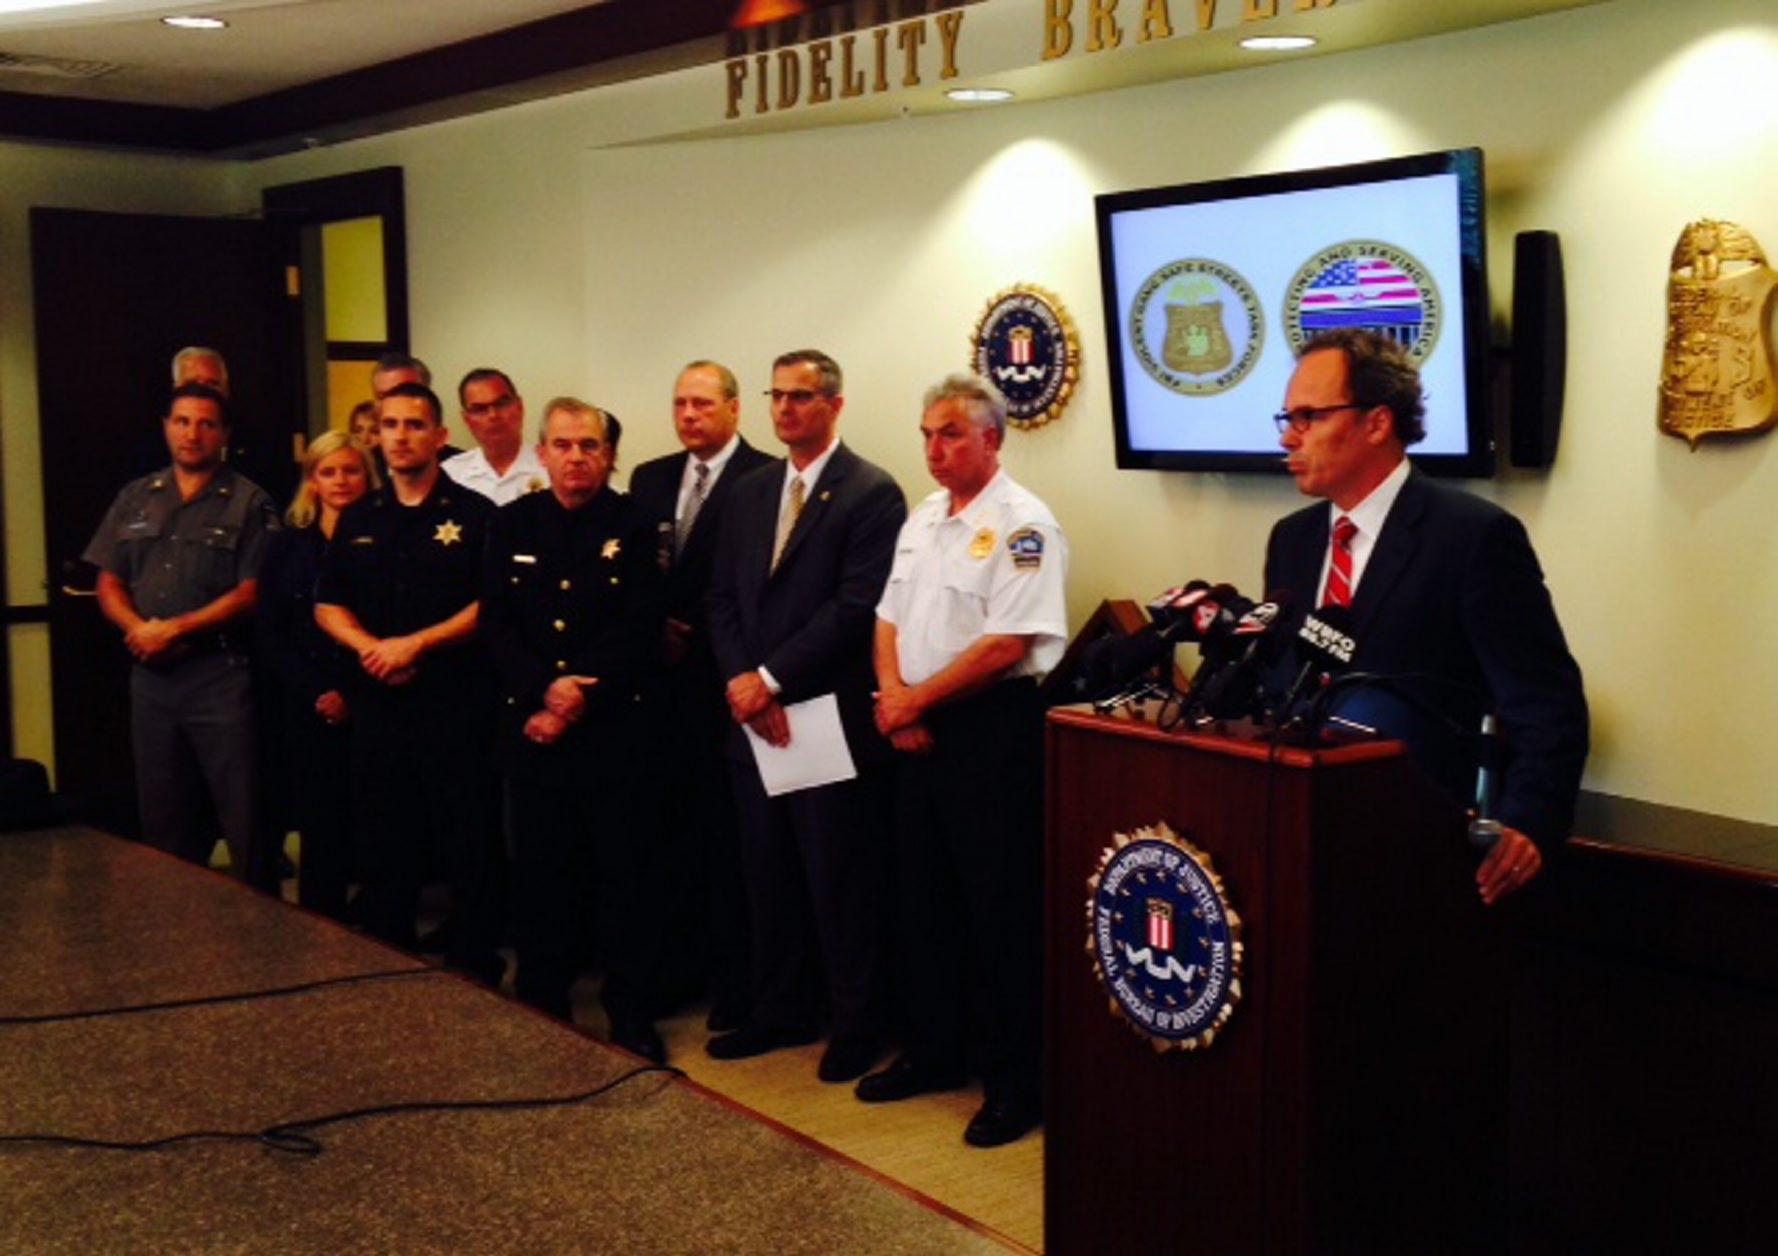 U.S. Attorney William Hochul discusses the drug bust.